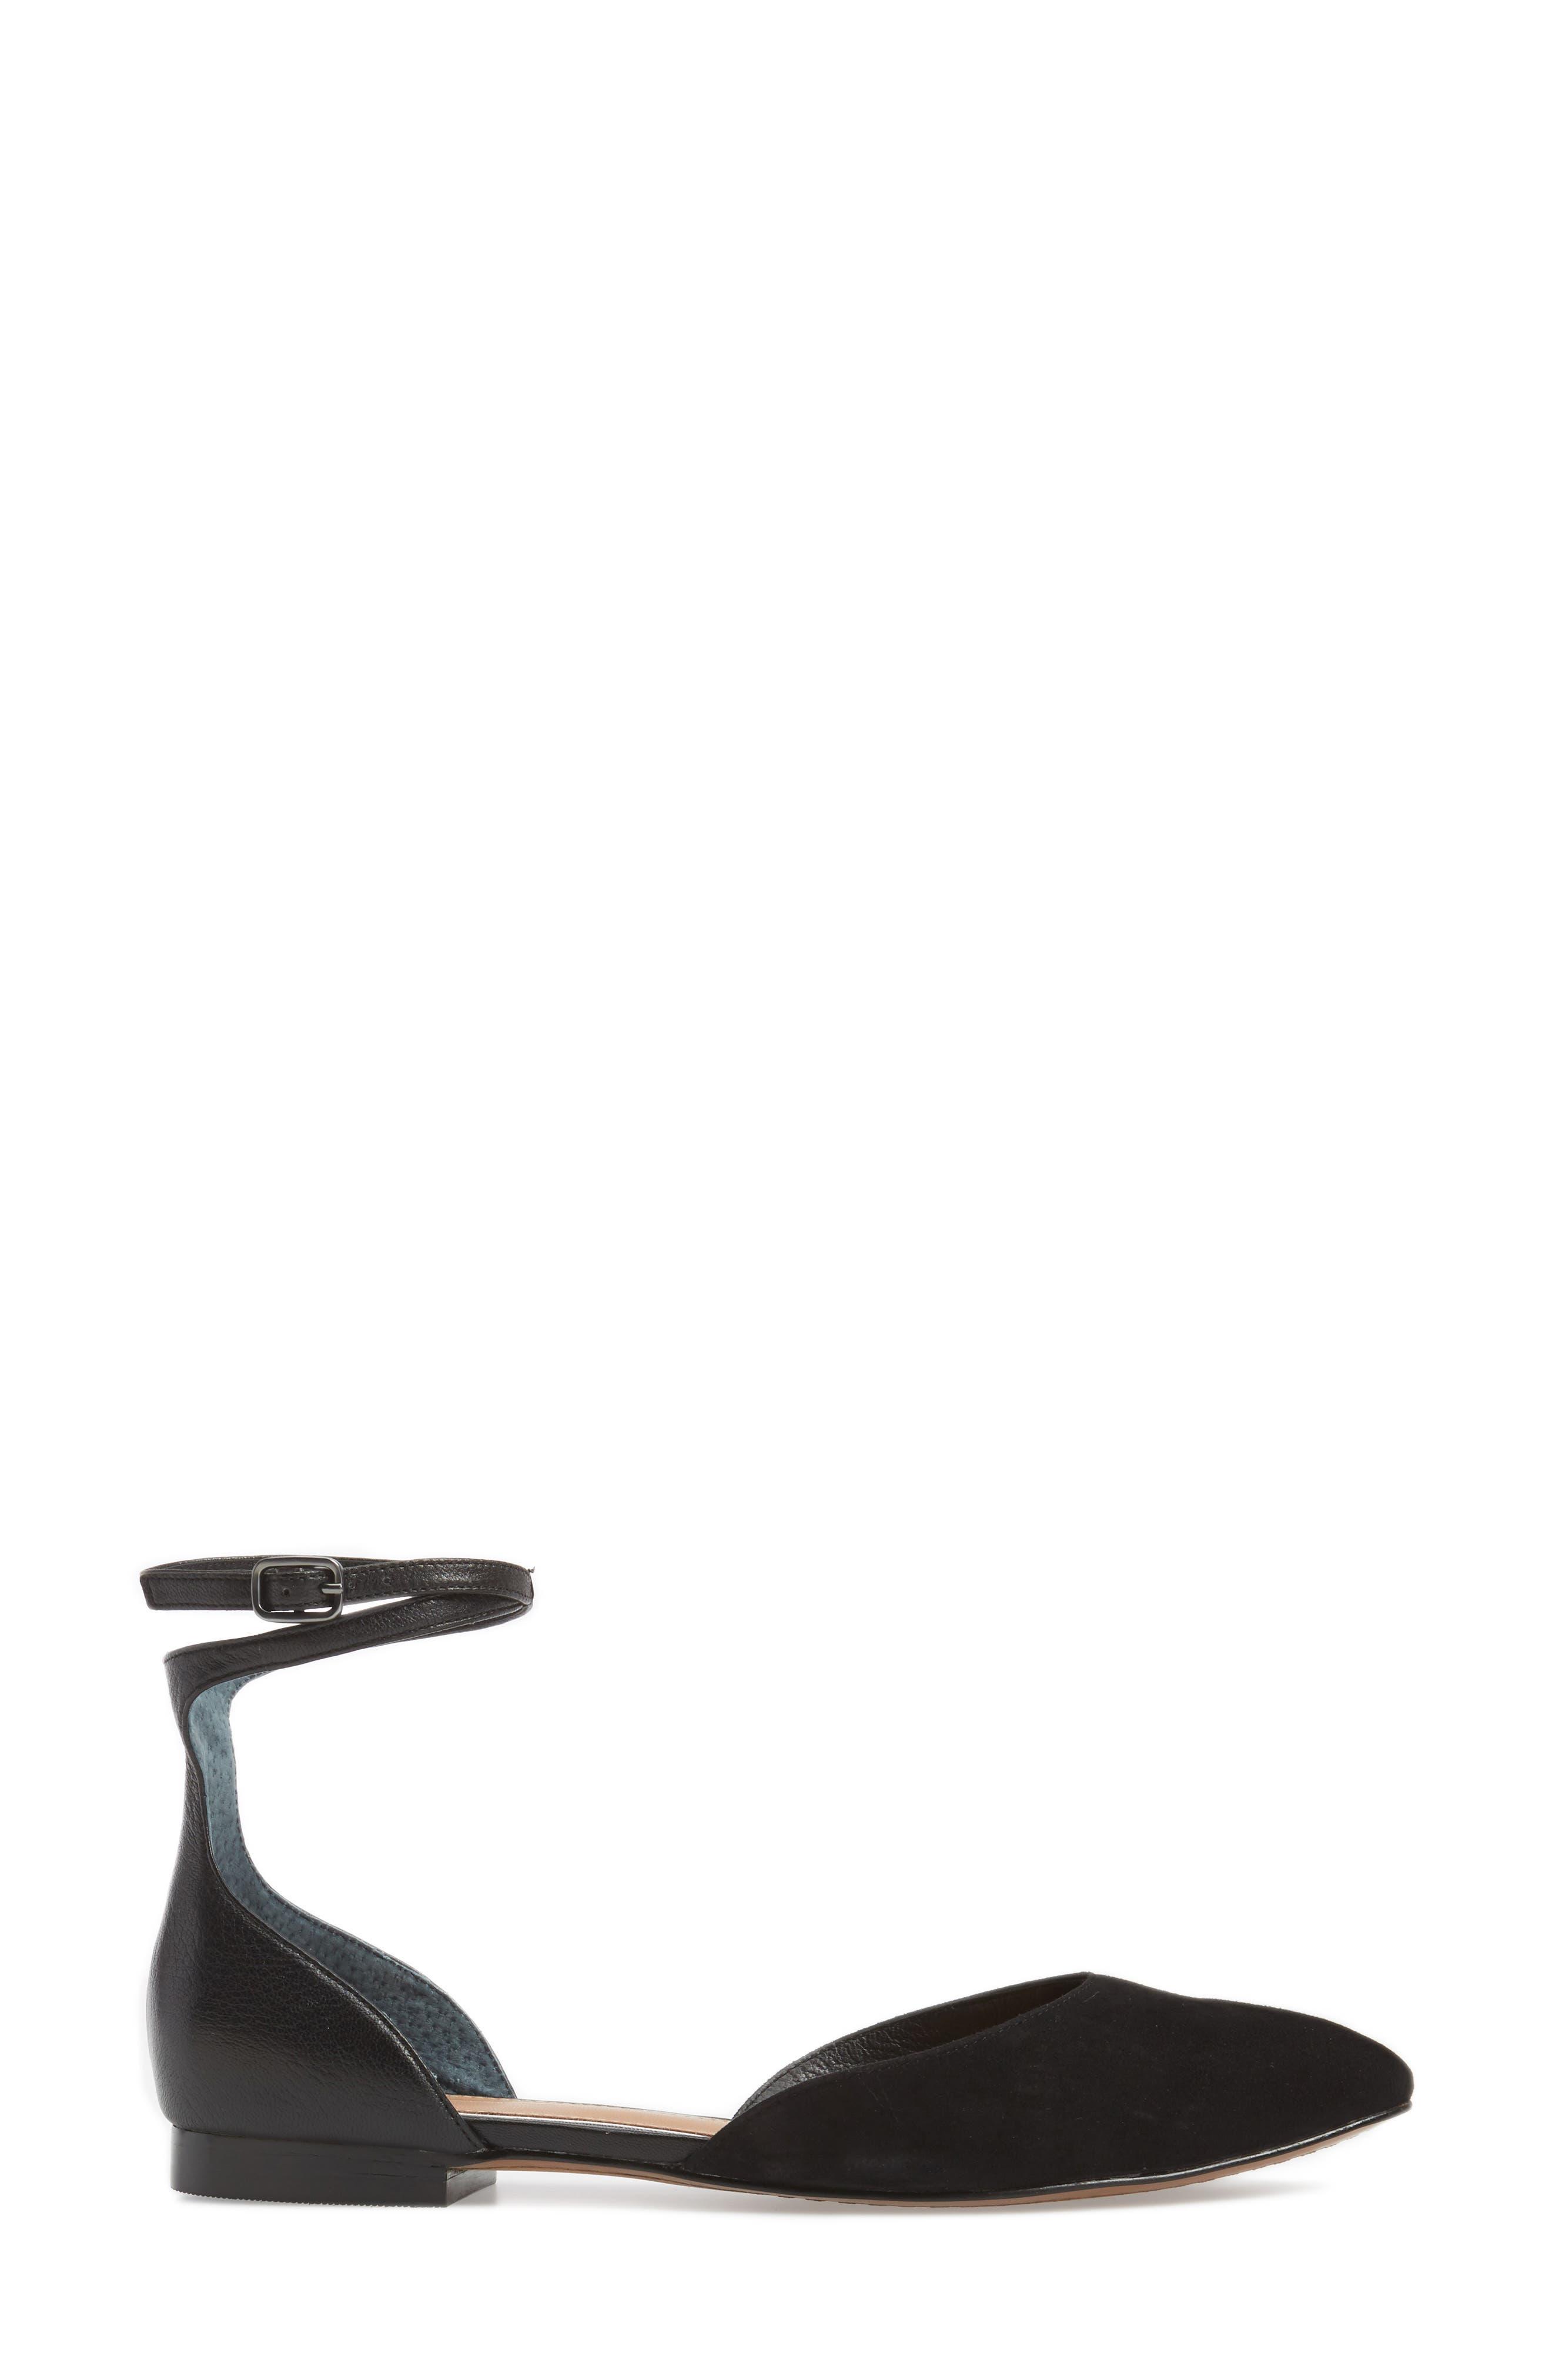 Alternate Image 3  - Linea Paolo Dario Ankle Strap Flat (Women)